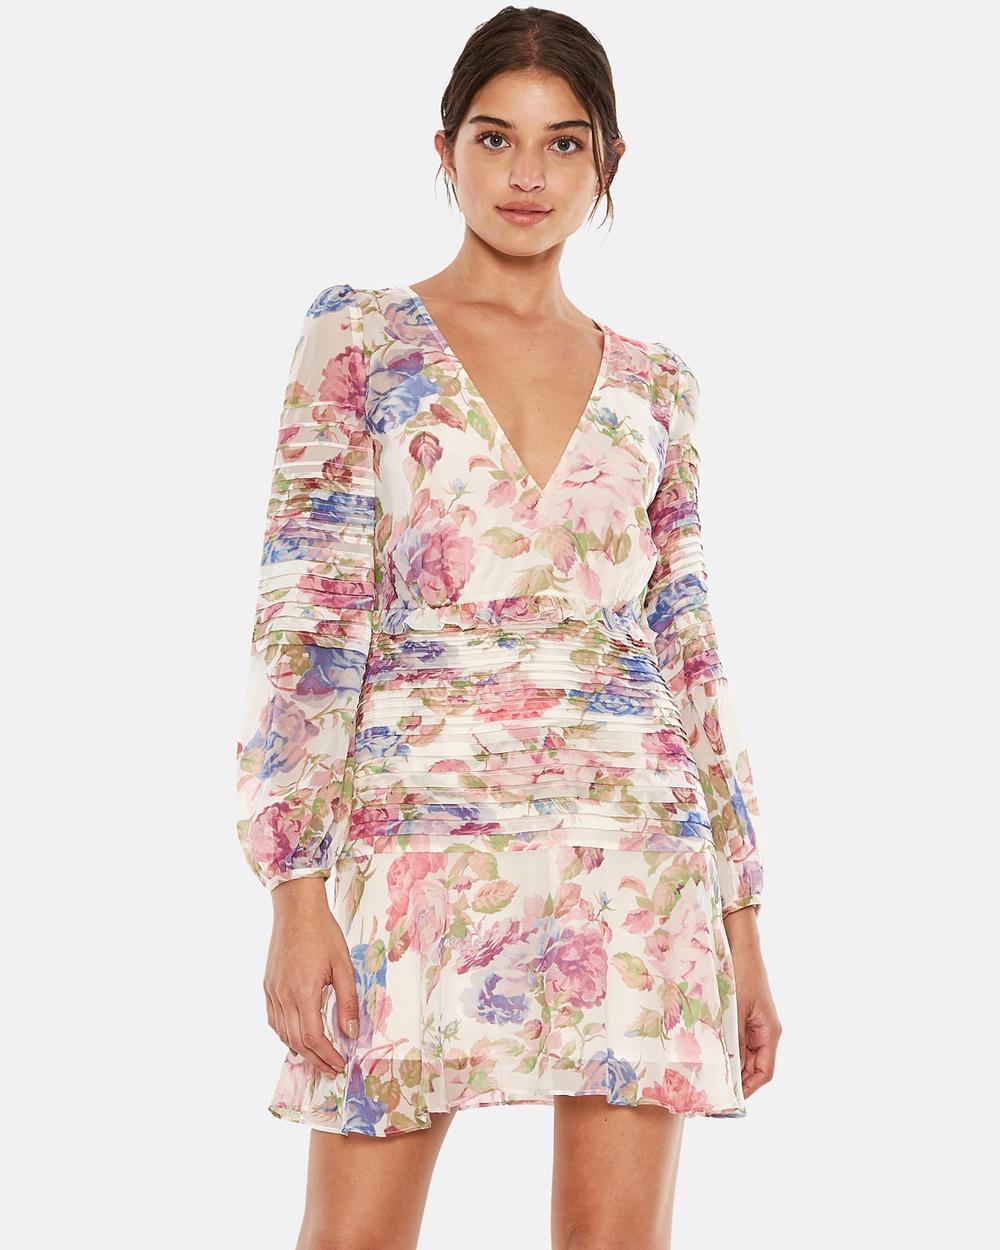 Talulah Epiphany LS Mini Dress Printed Dresses Floral Multi Epiphany LS Mini Dress